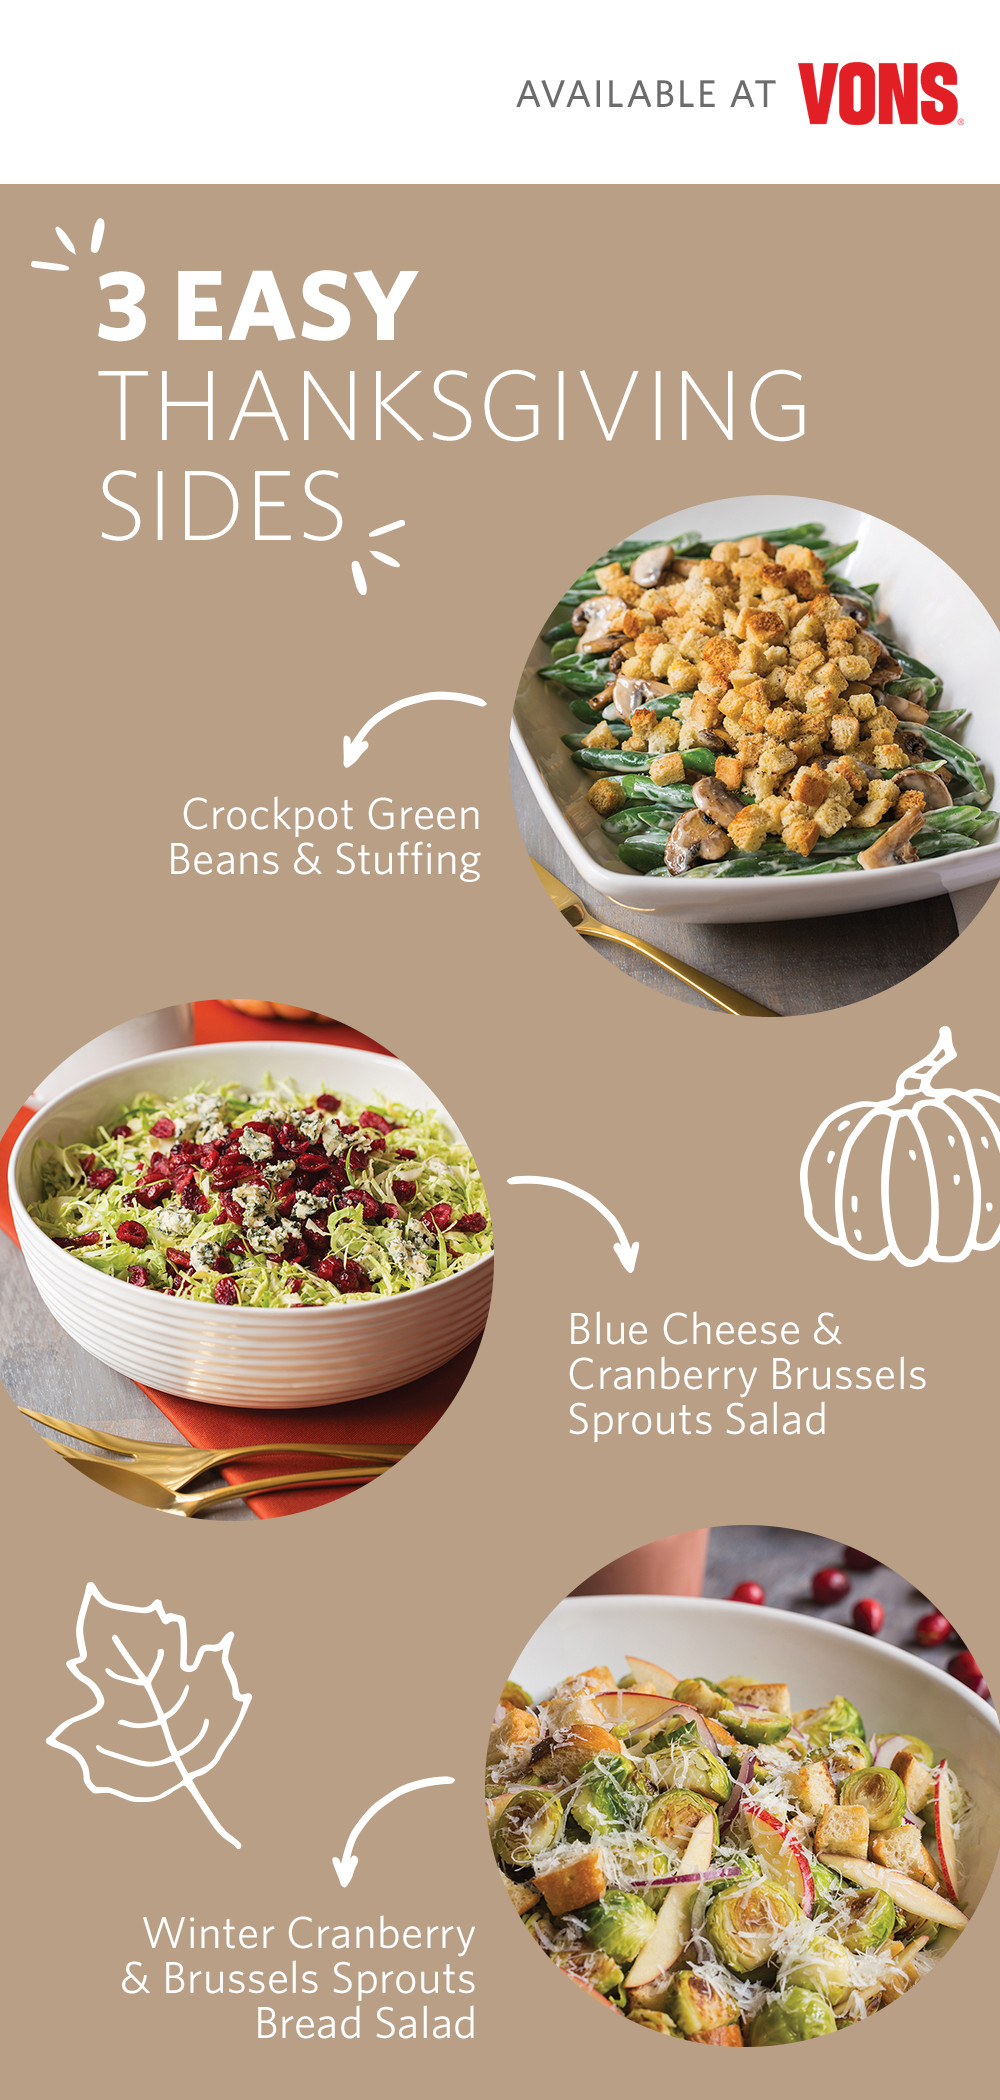 Albertsons Thanksgiving Dinner 2019  Vons Thanksgiving Deals